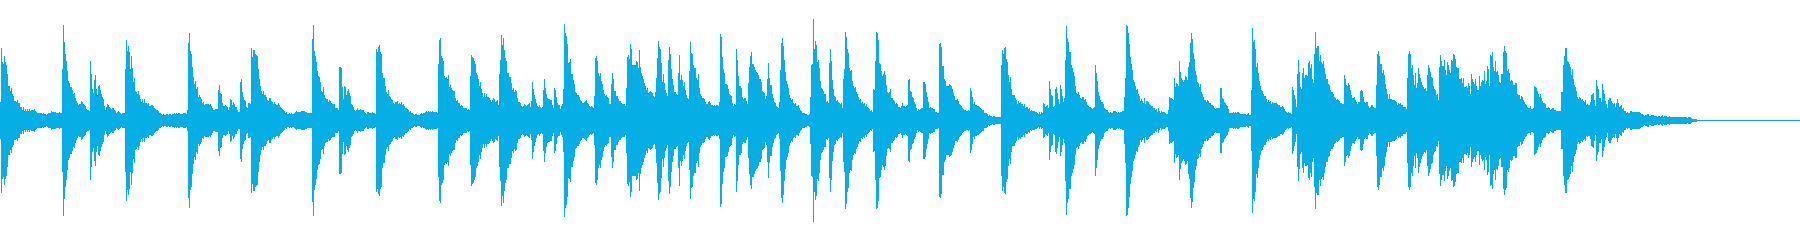 StockMusic33_PianoSamplerの再生済みの波形